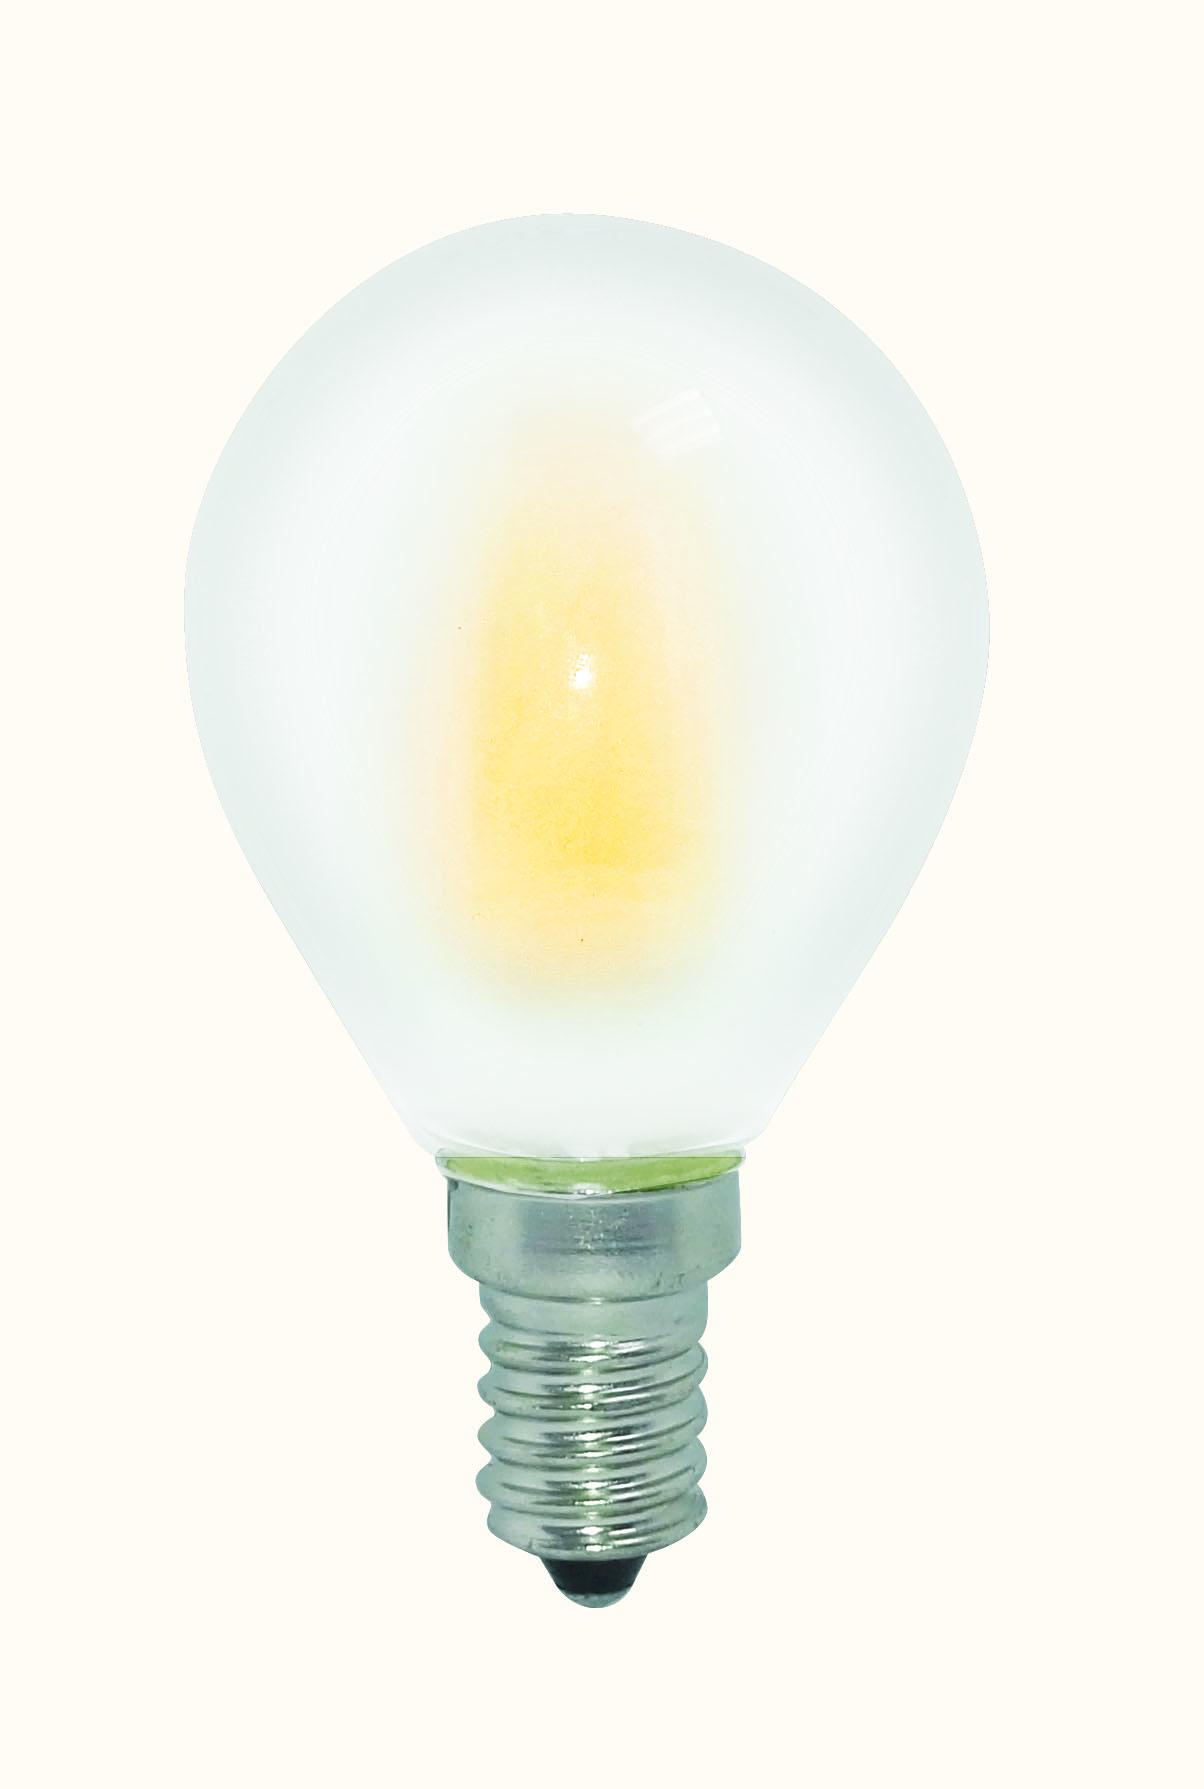 Светодиодная лампа VKlux BK-14W5G45 Frosted Шар